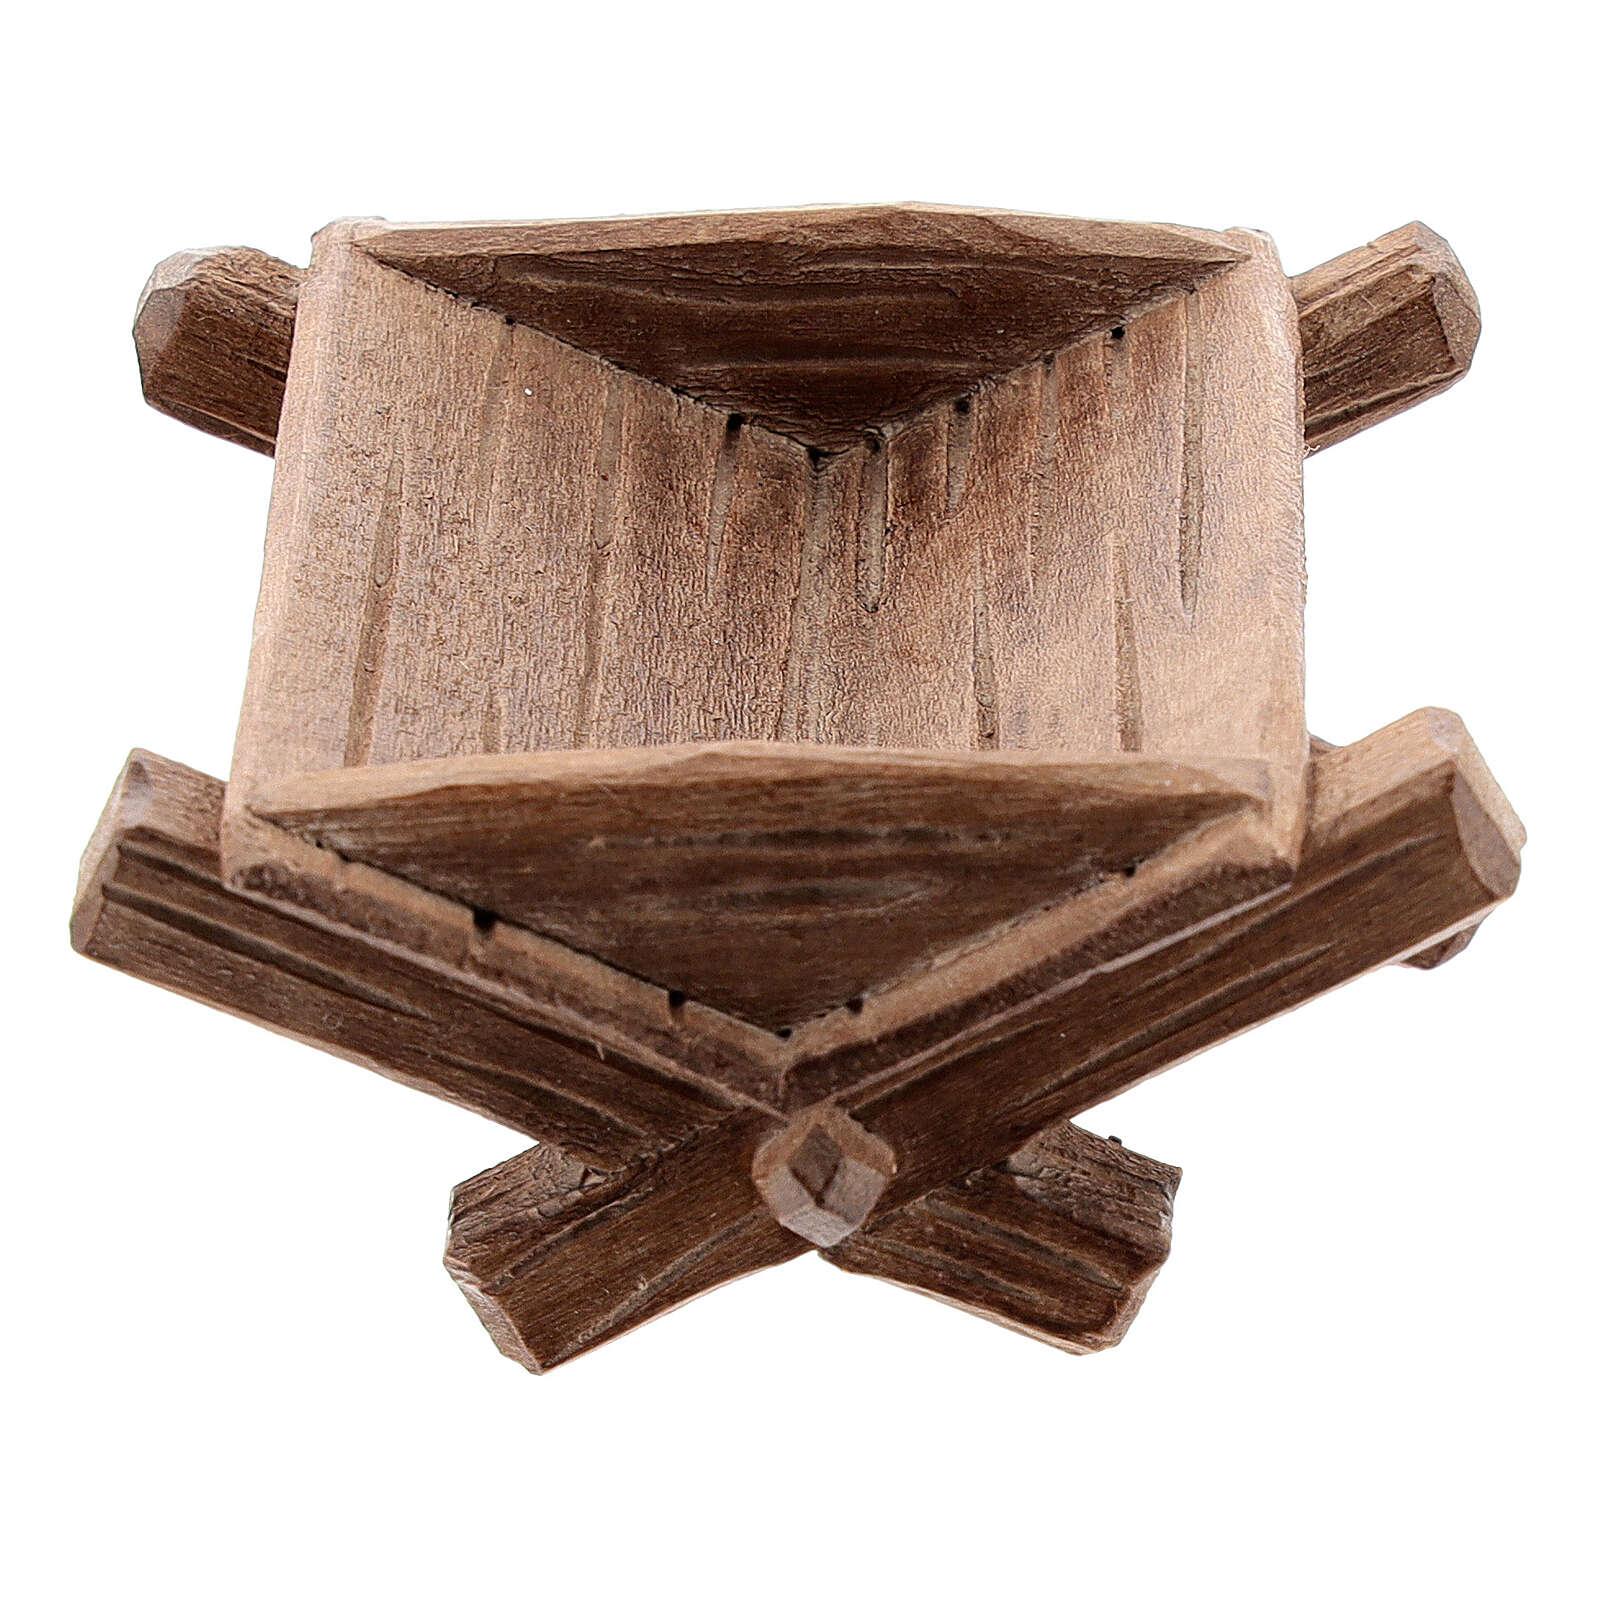 Culla semplice per Bambinello legno dipinto presepe Kostner 12 cm 4